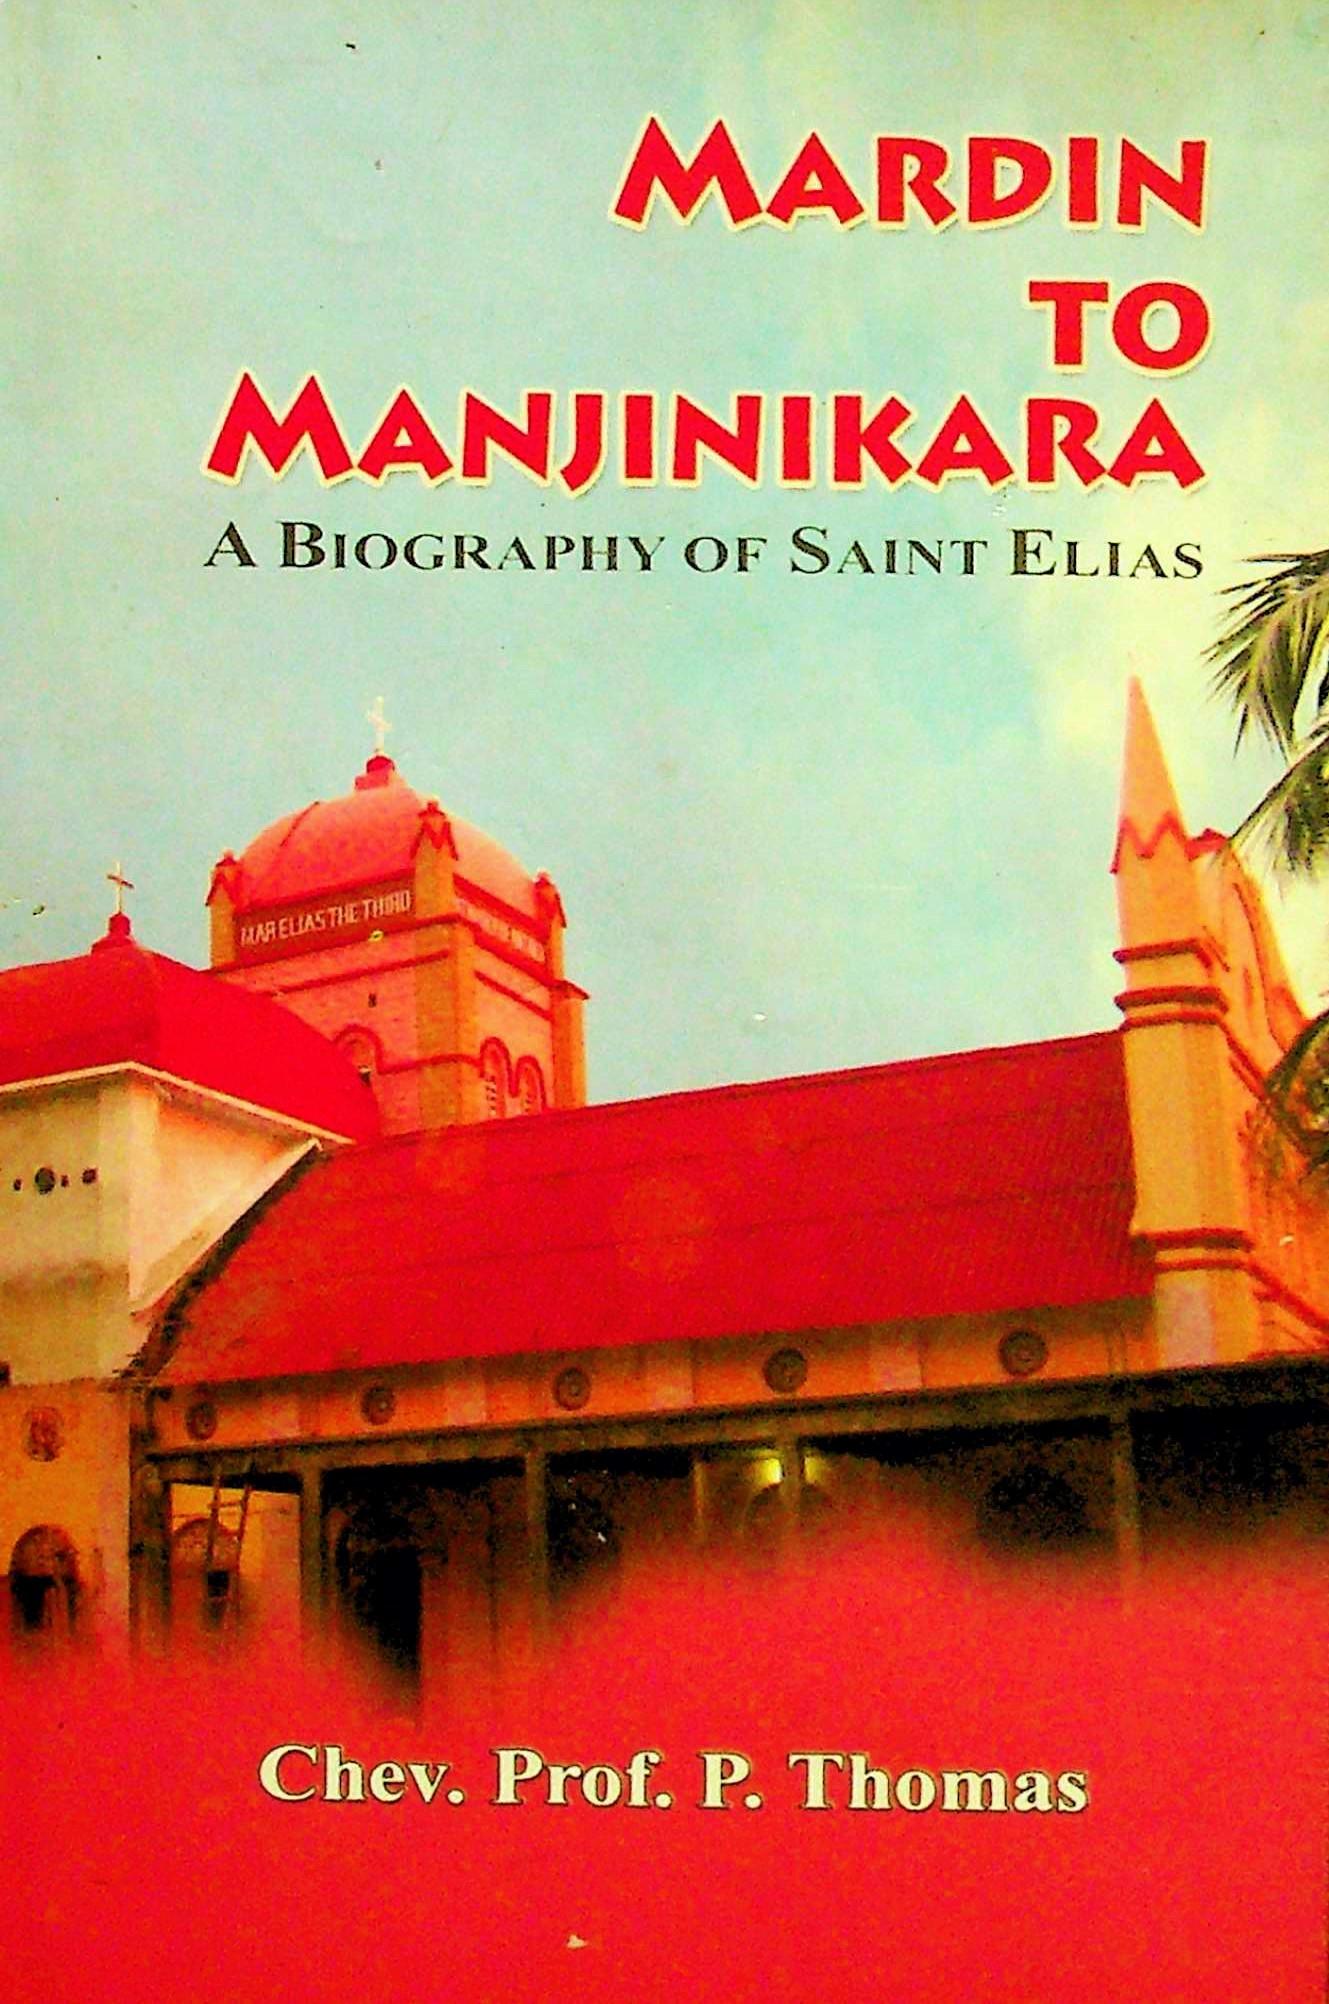 Mardin to Majinikara, A Biography of St. Elias